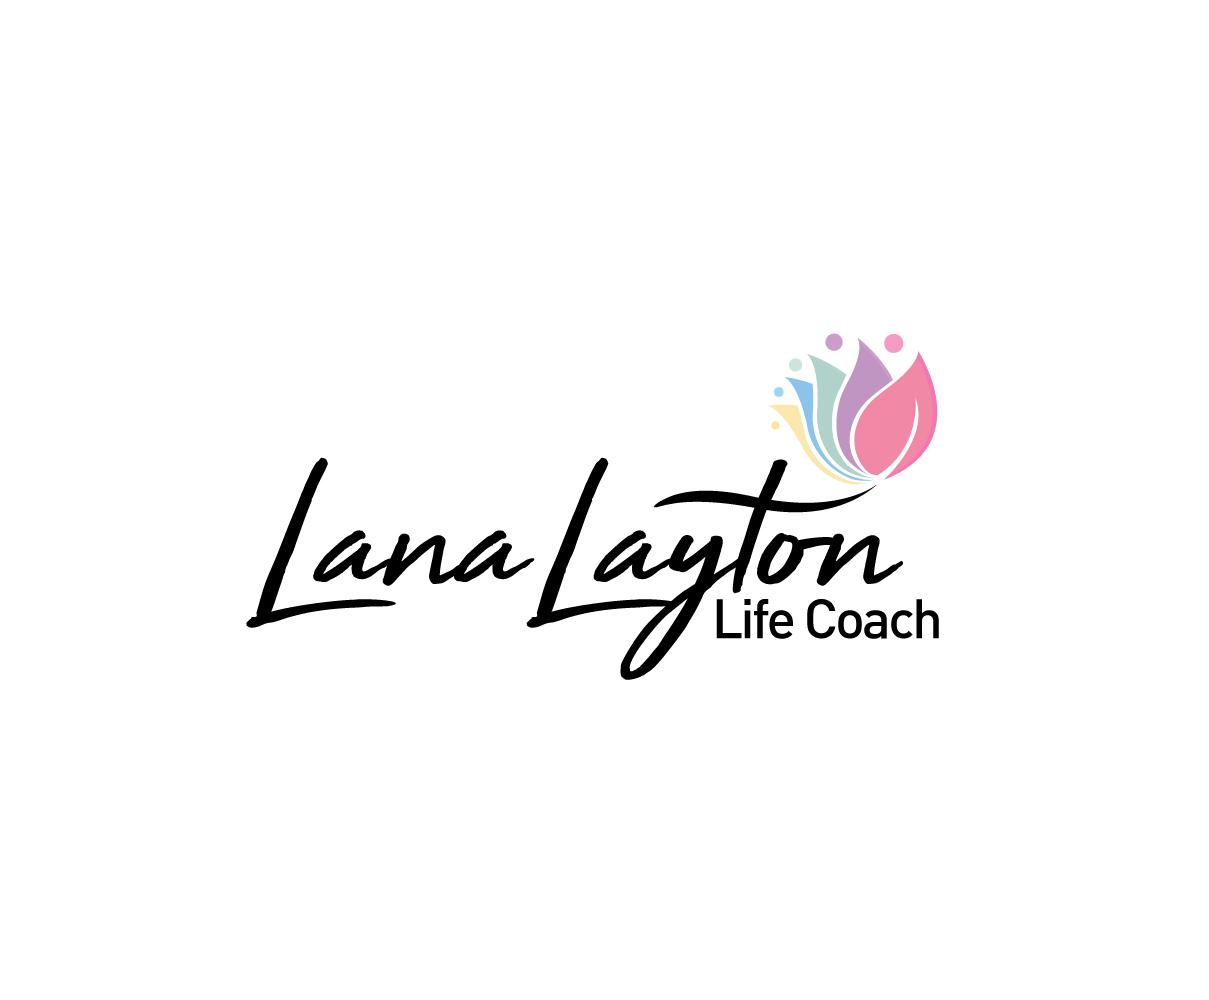 conservative serious life coaching logo design for lana